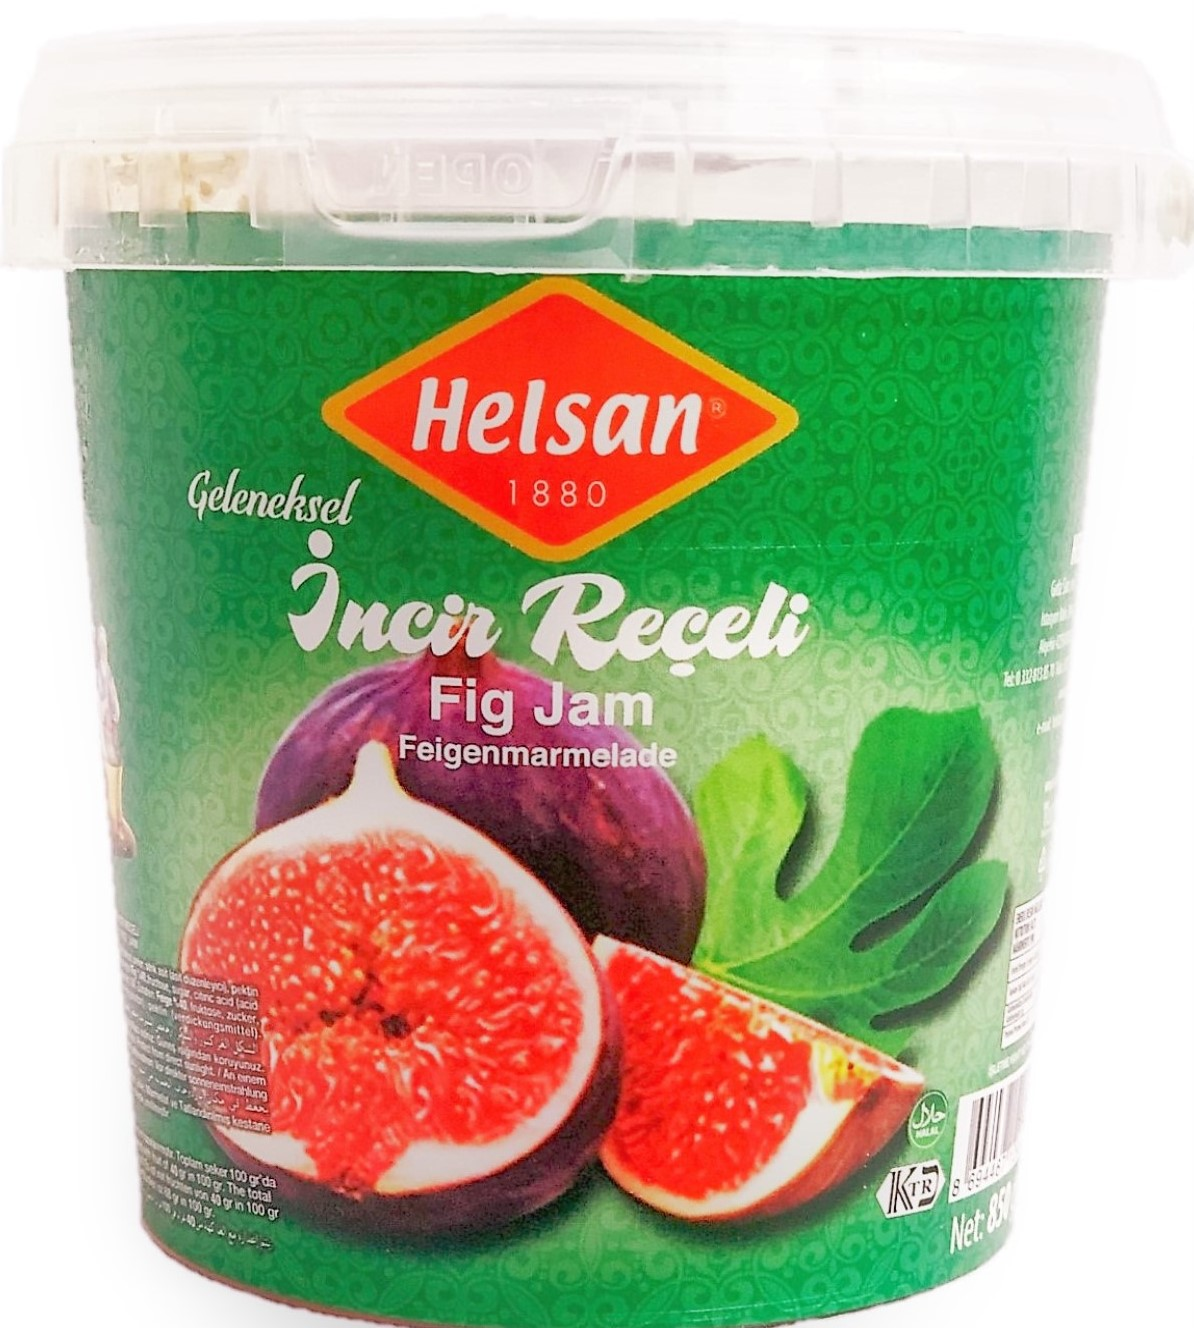 HELSAN RECEL INCIR 900gr PET (confiture de figue)